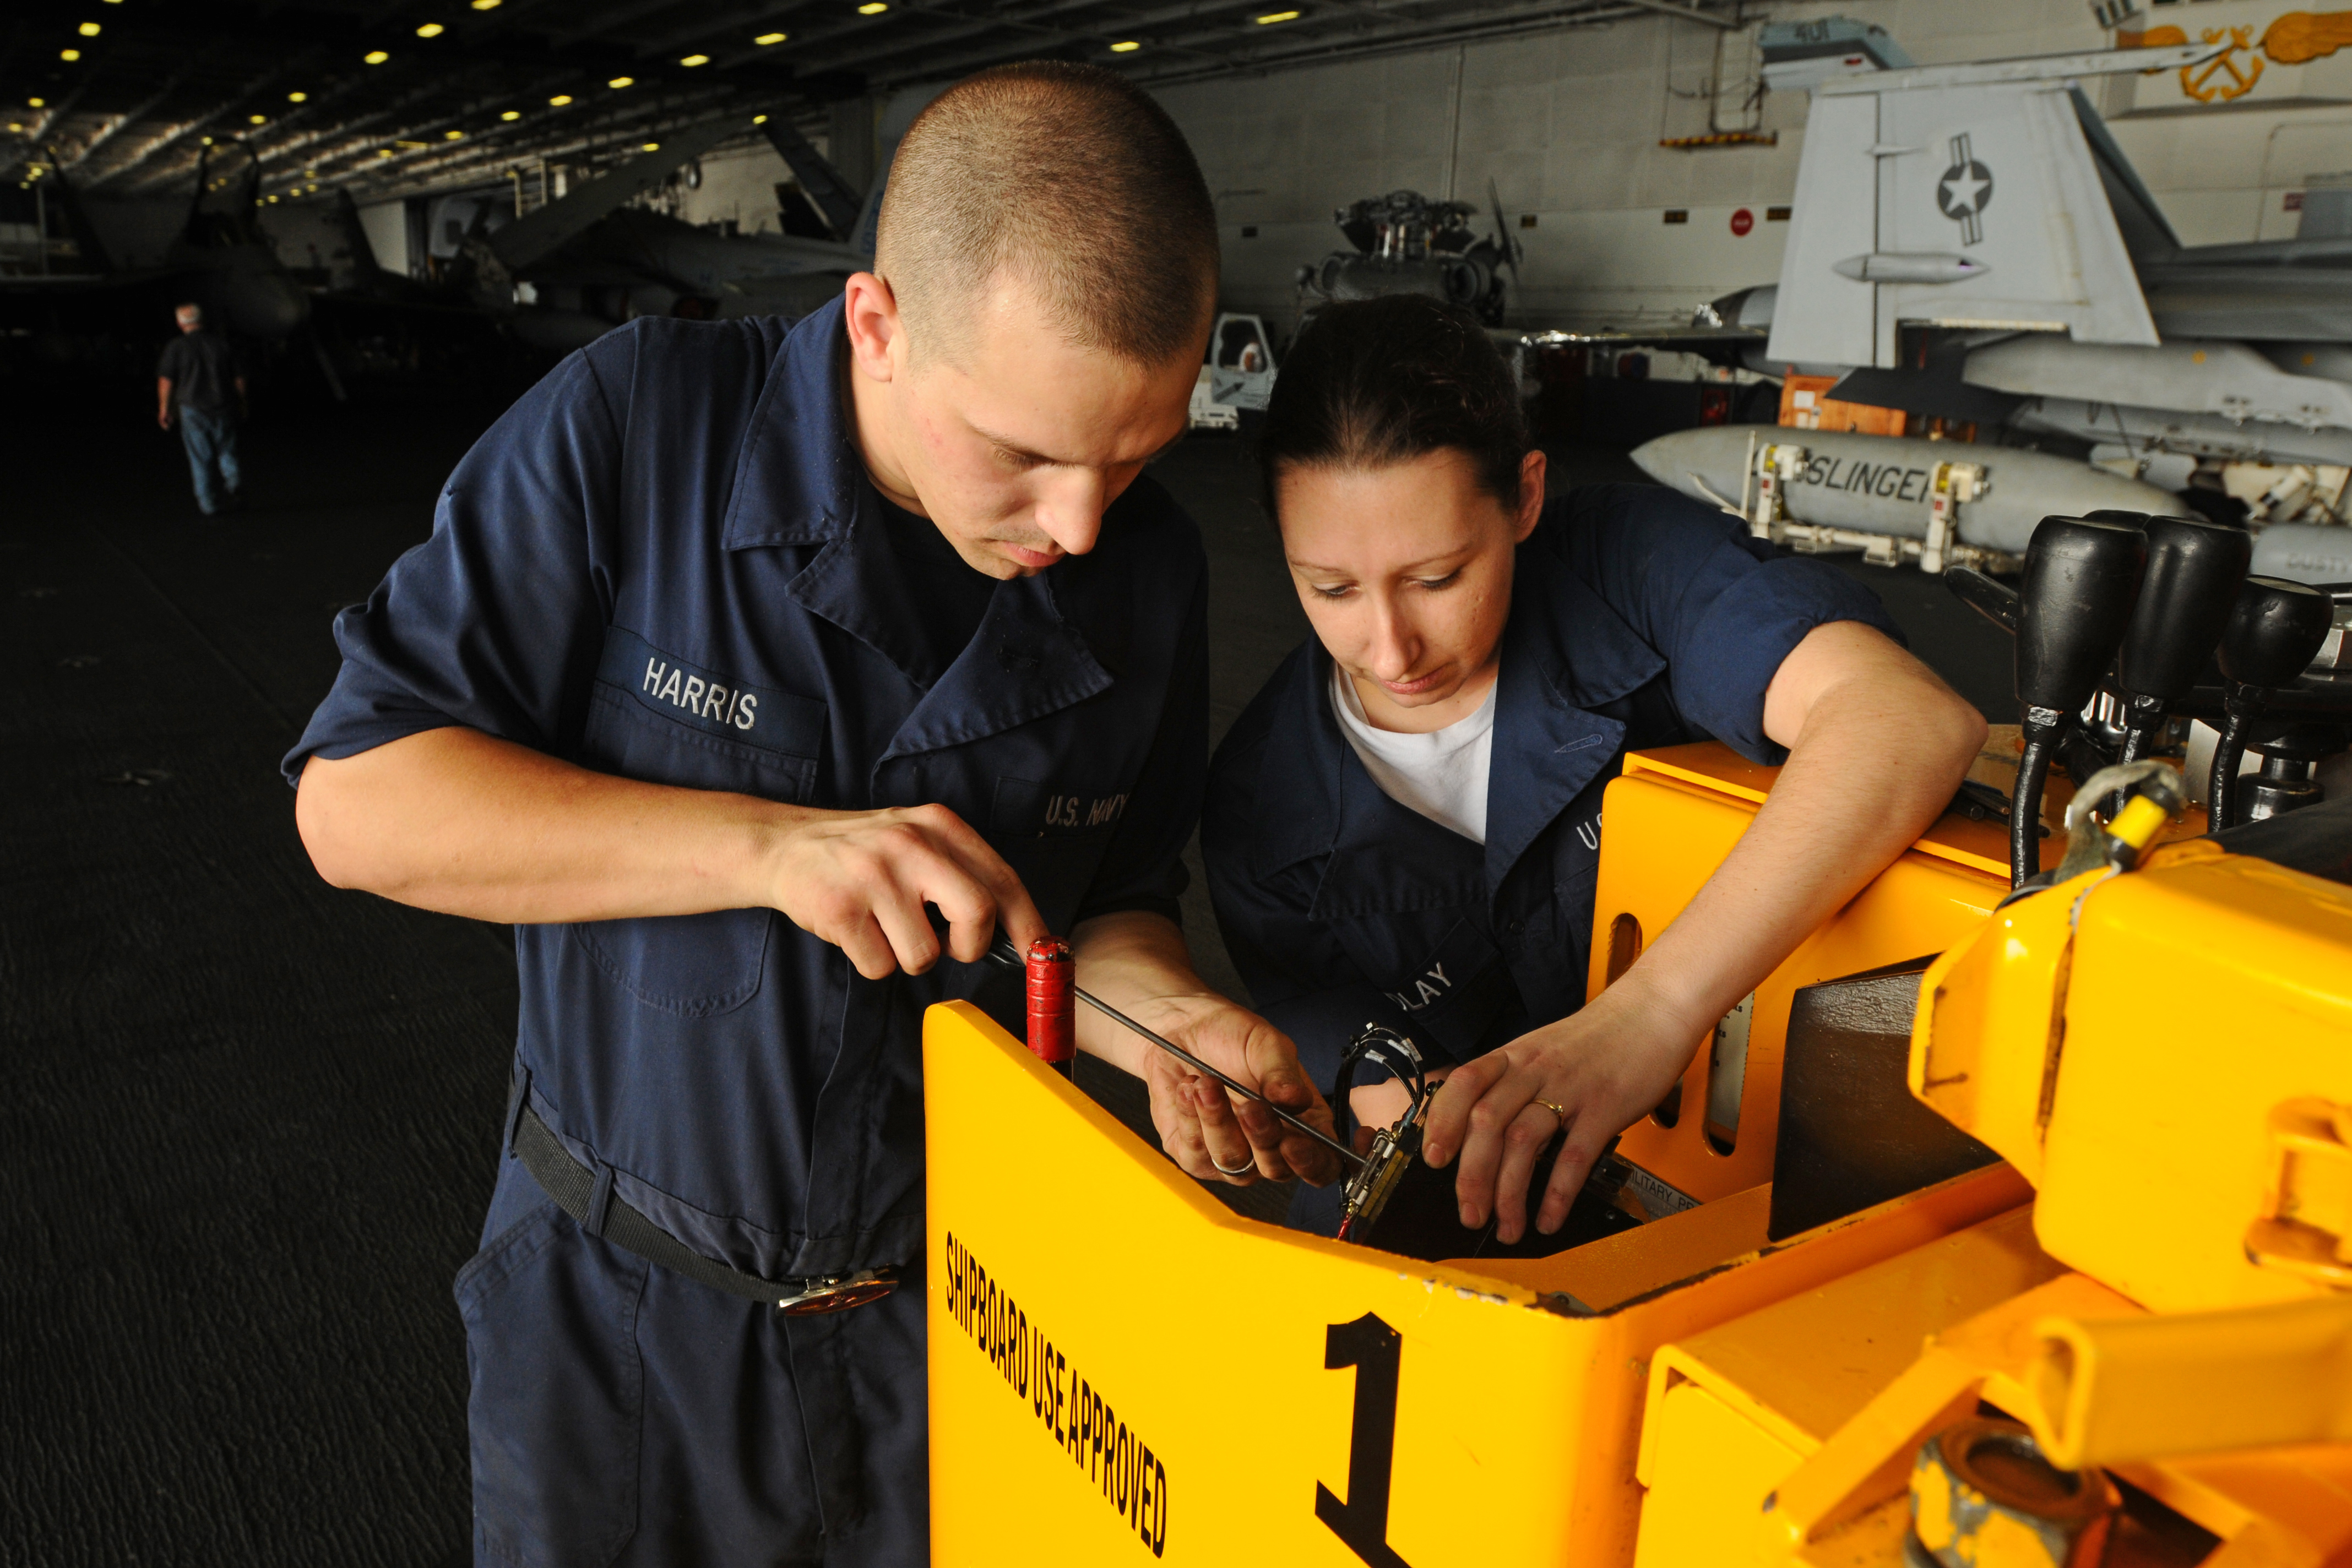 FileUS Navy NP Aviation Ordnanceman David Harris - Forklift mechanic